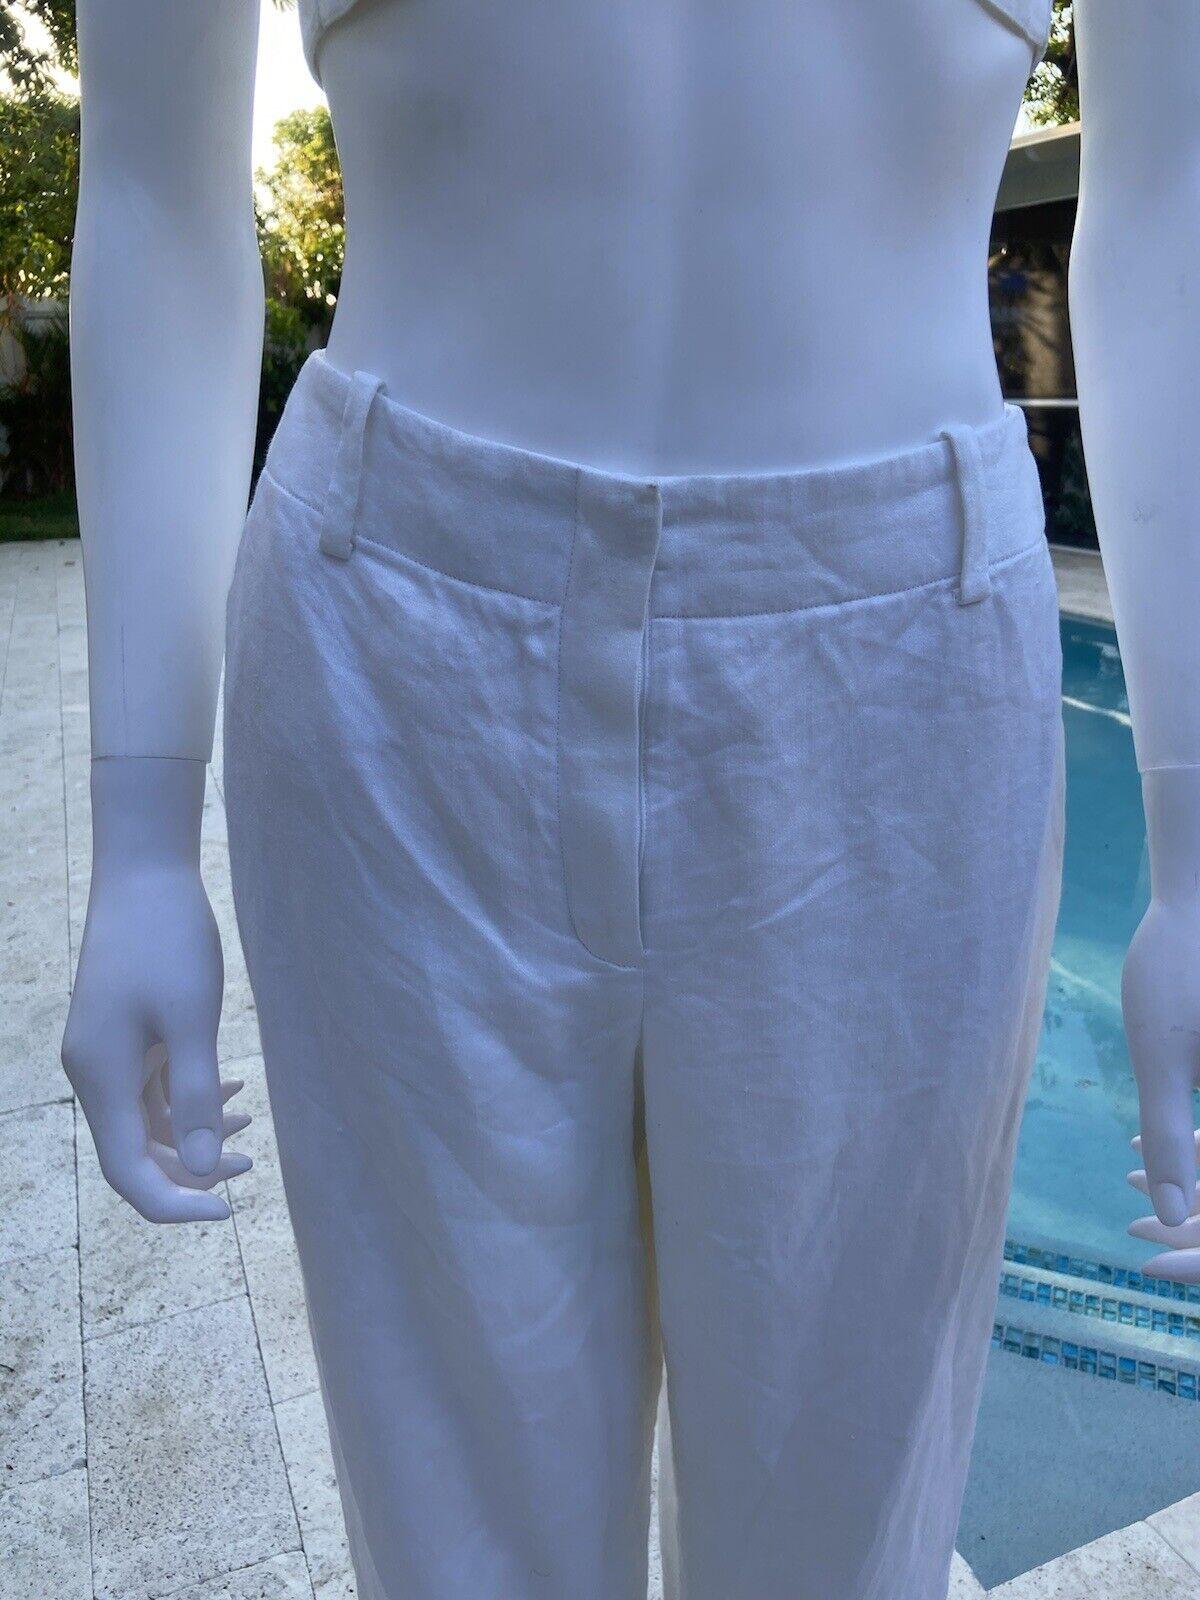 Vintage Hermes Linen Suit 36 - image 3